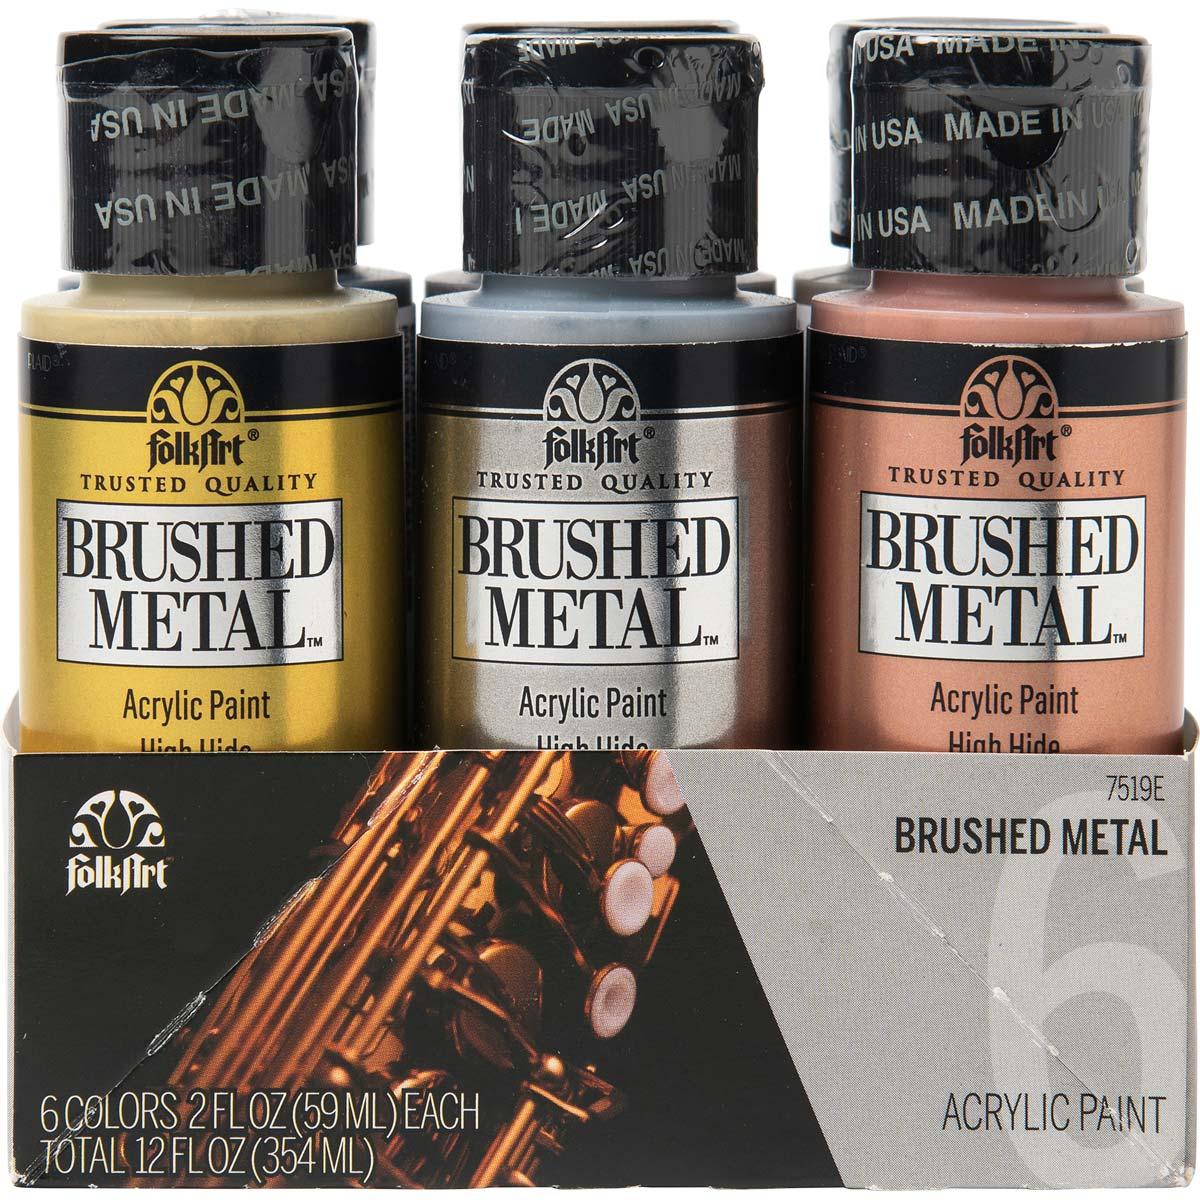 FolkArt ® Brushed Metal™ Acrylic Paint Set 6 Color - 7519E